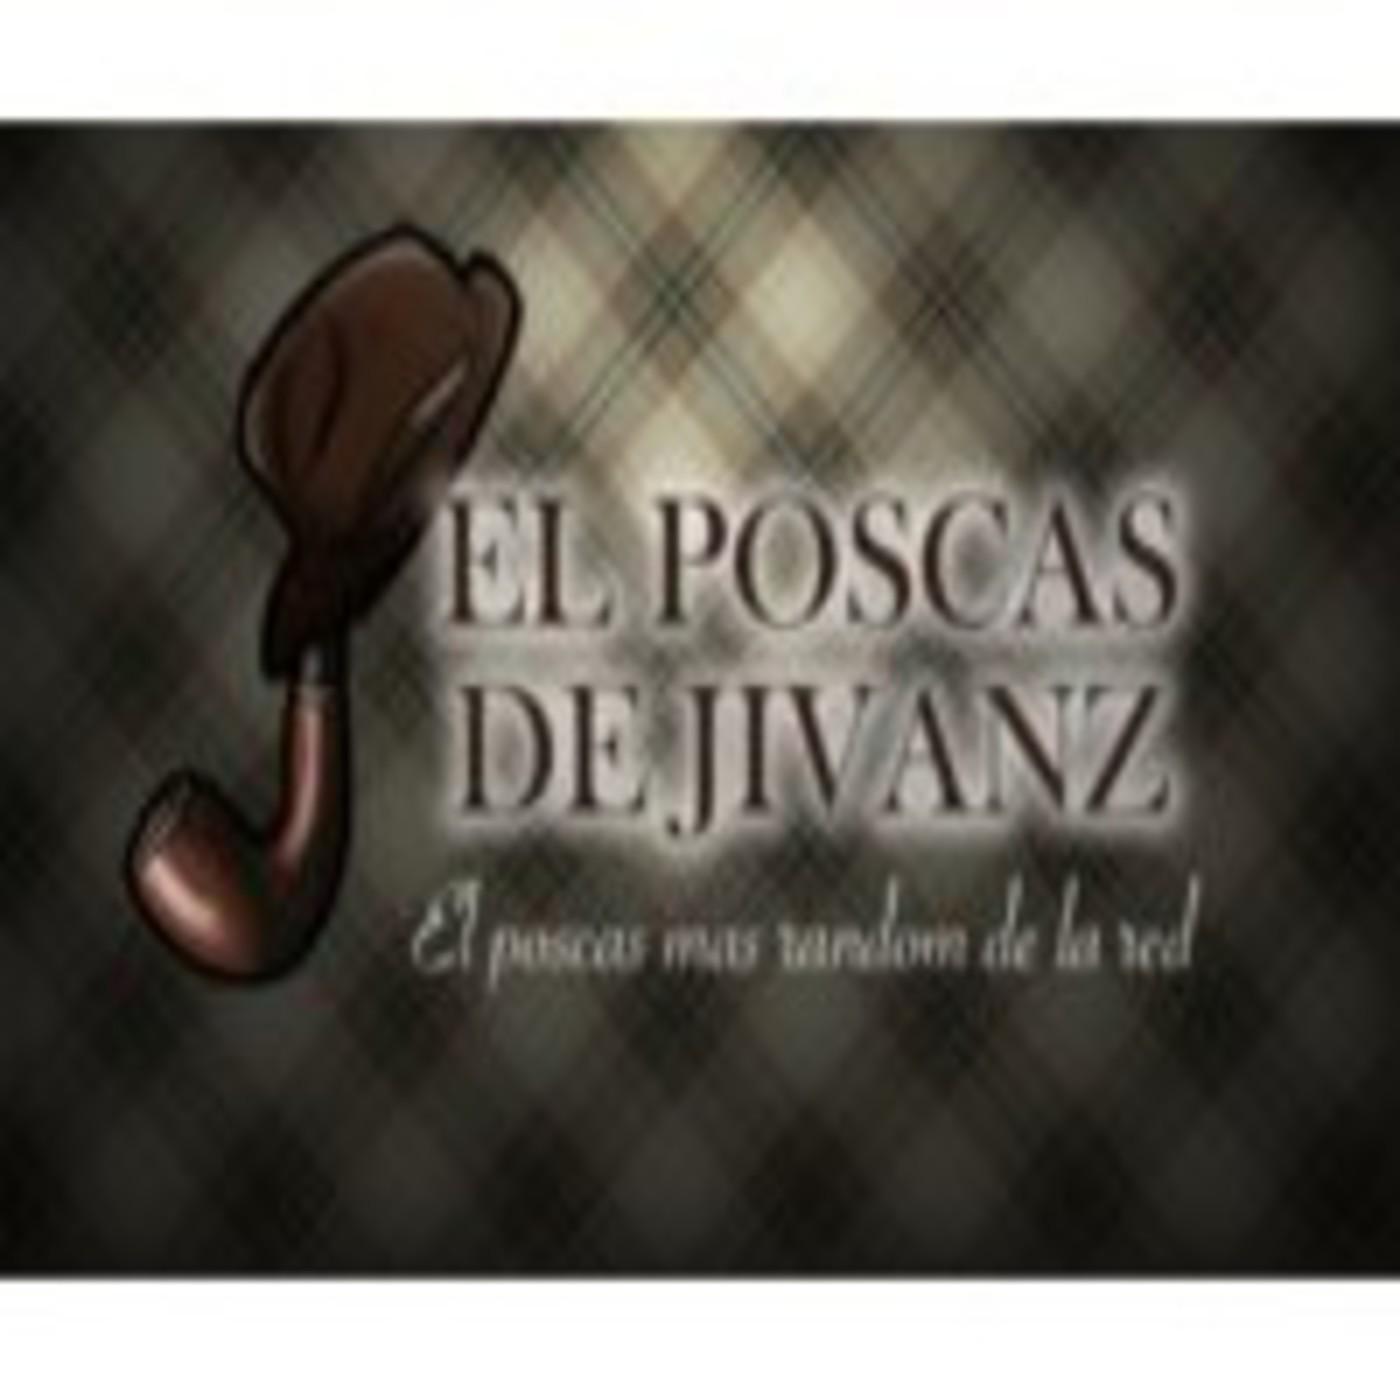 <![CDATA[Podcast El Poscas de Jivanz]]>